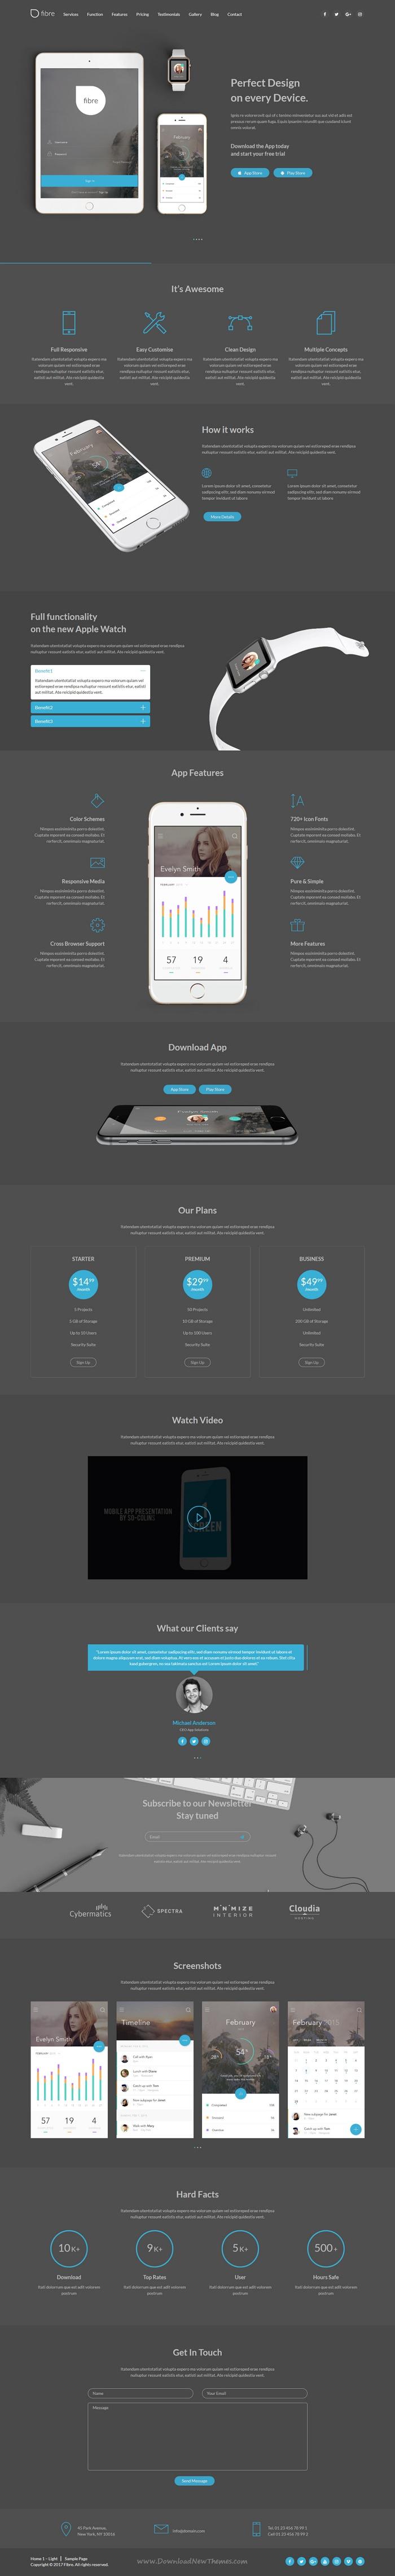 Fibre - App Landing Page WordPress Theme | Wordpress, App and ...